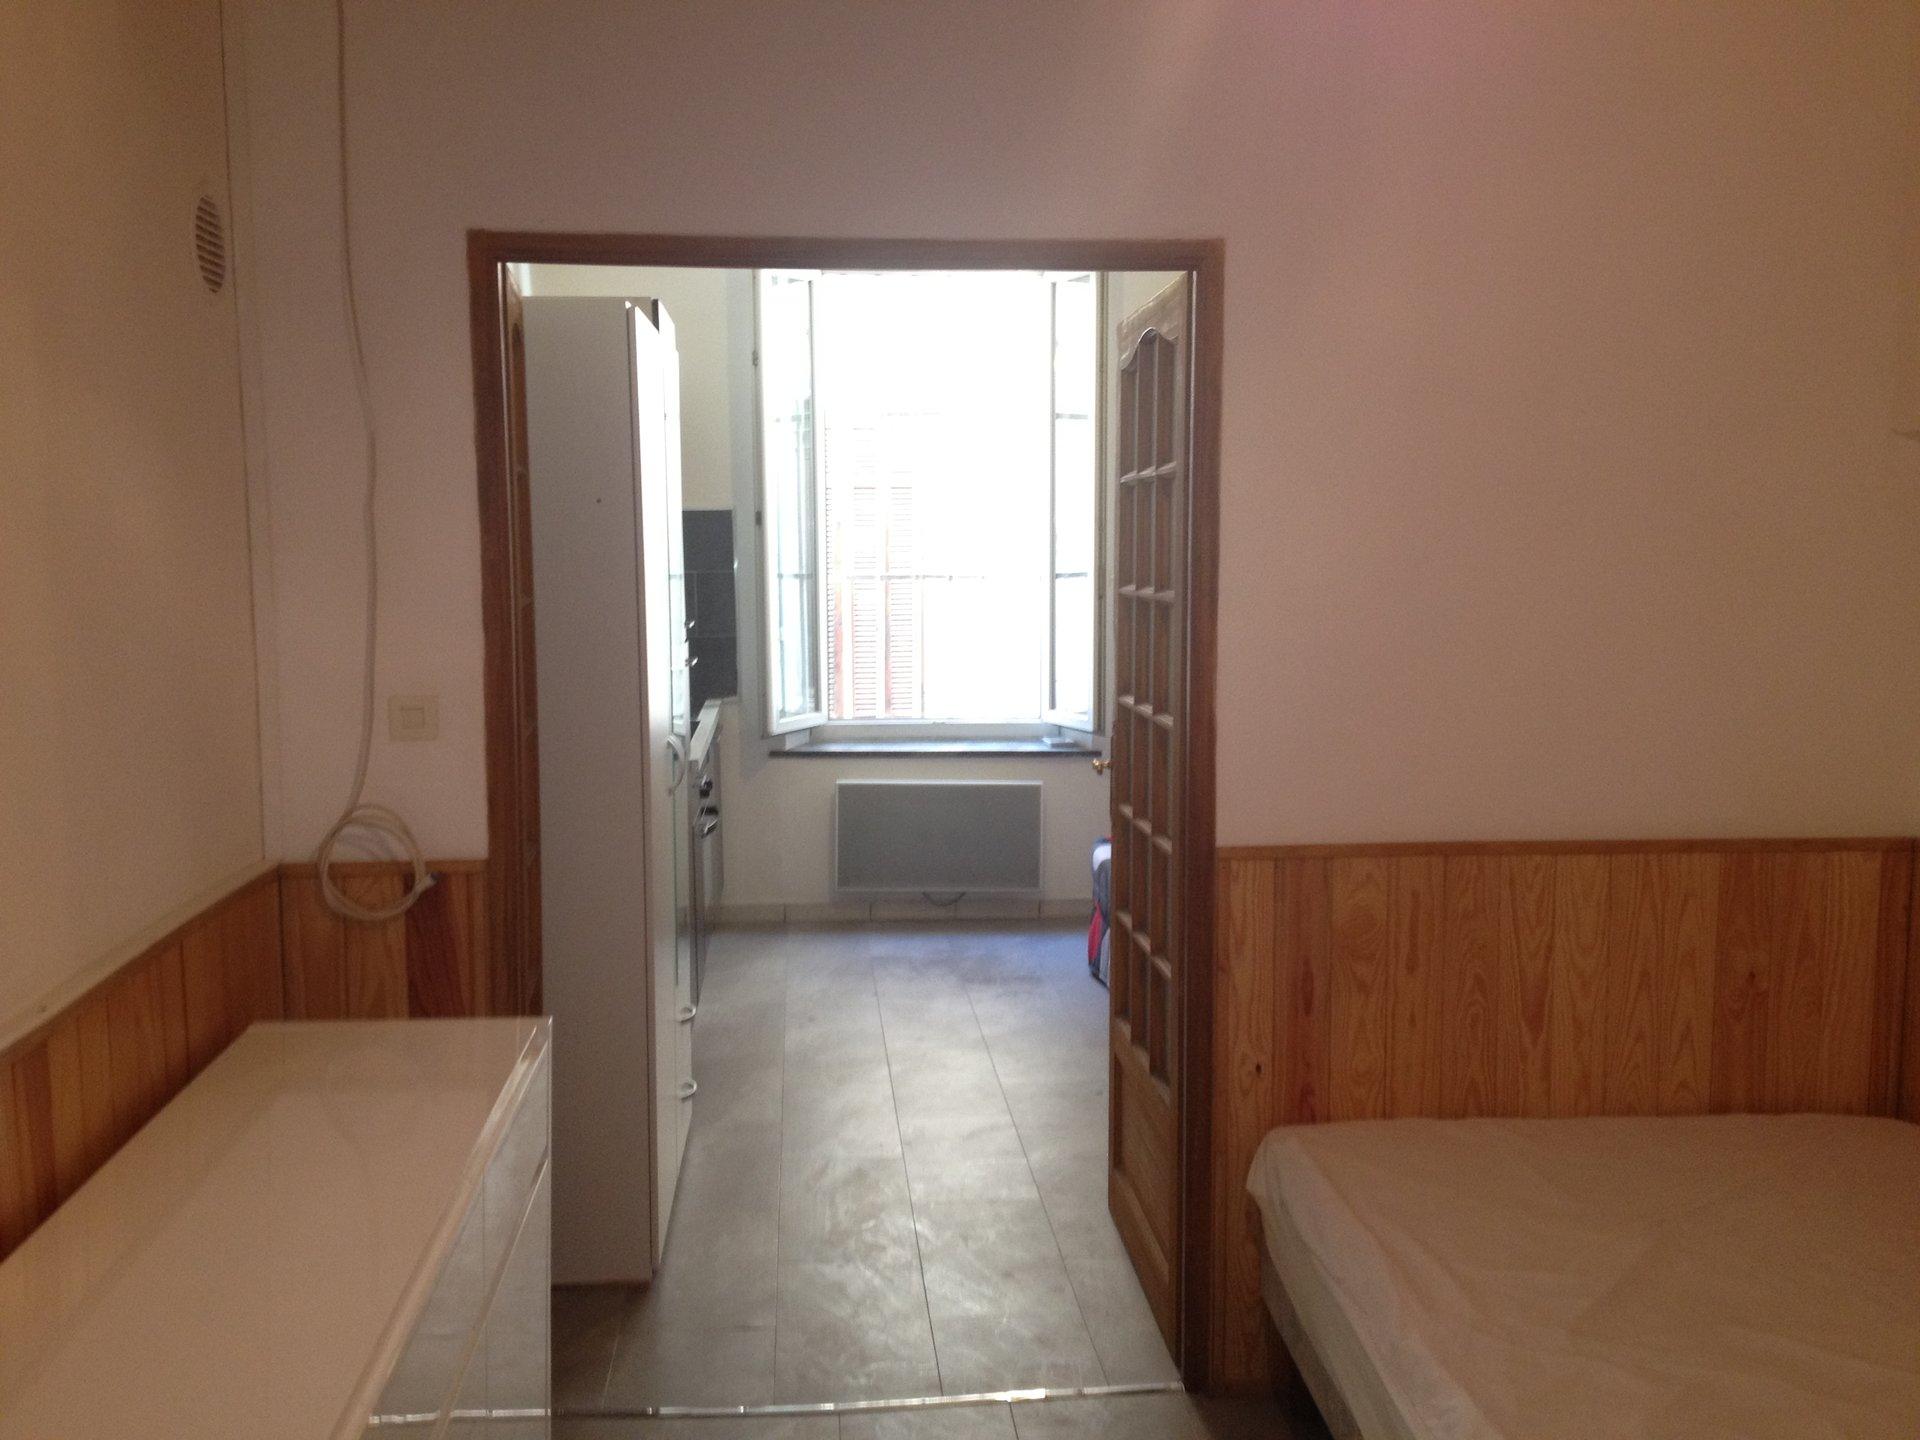 Appartement vendu loué - La Ciotat